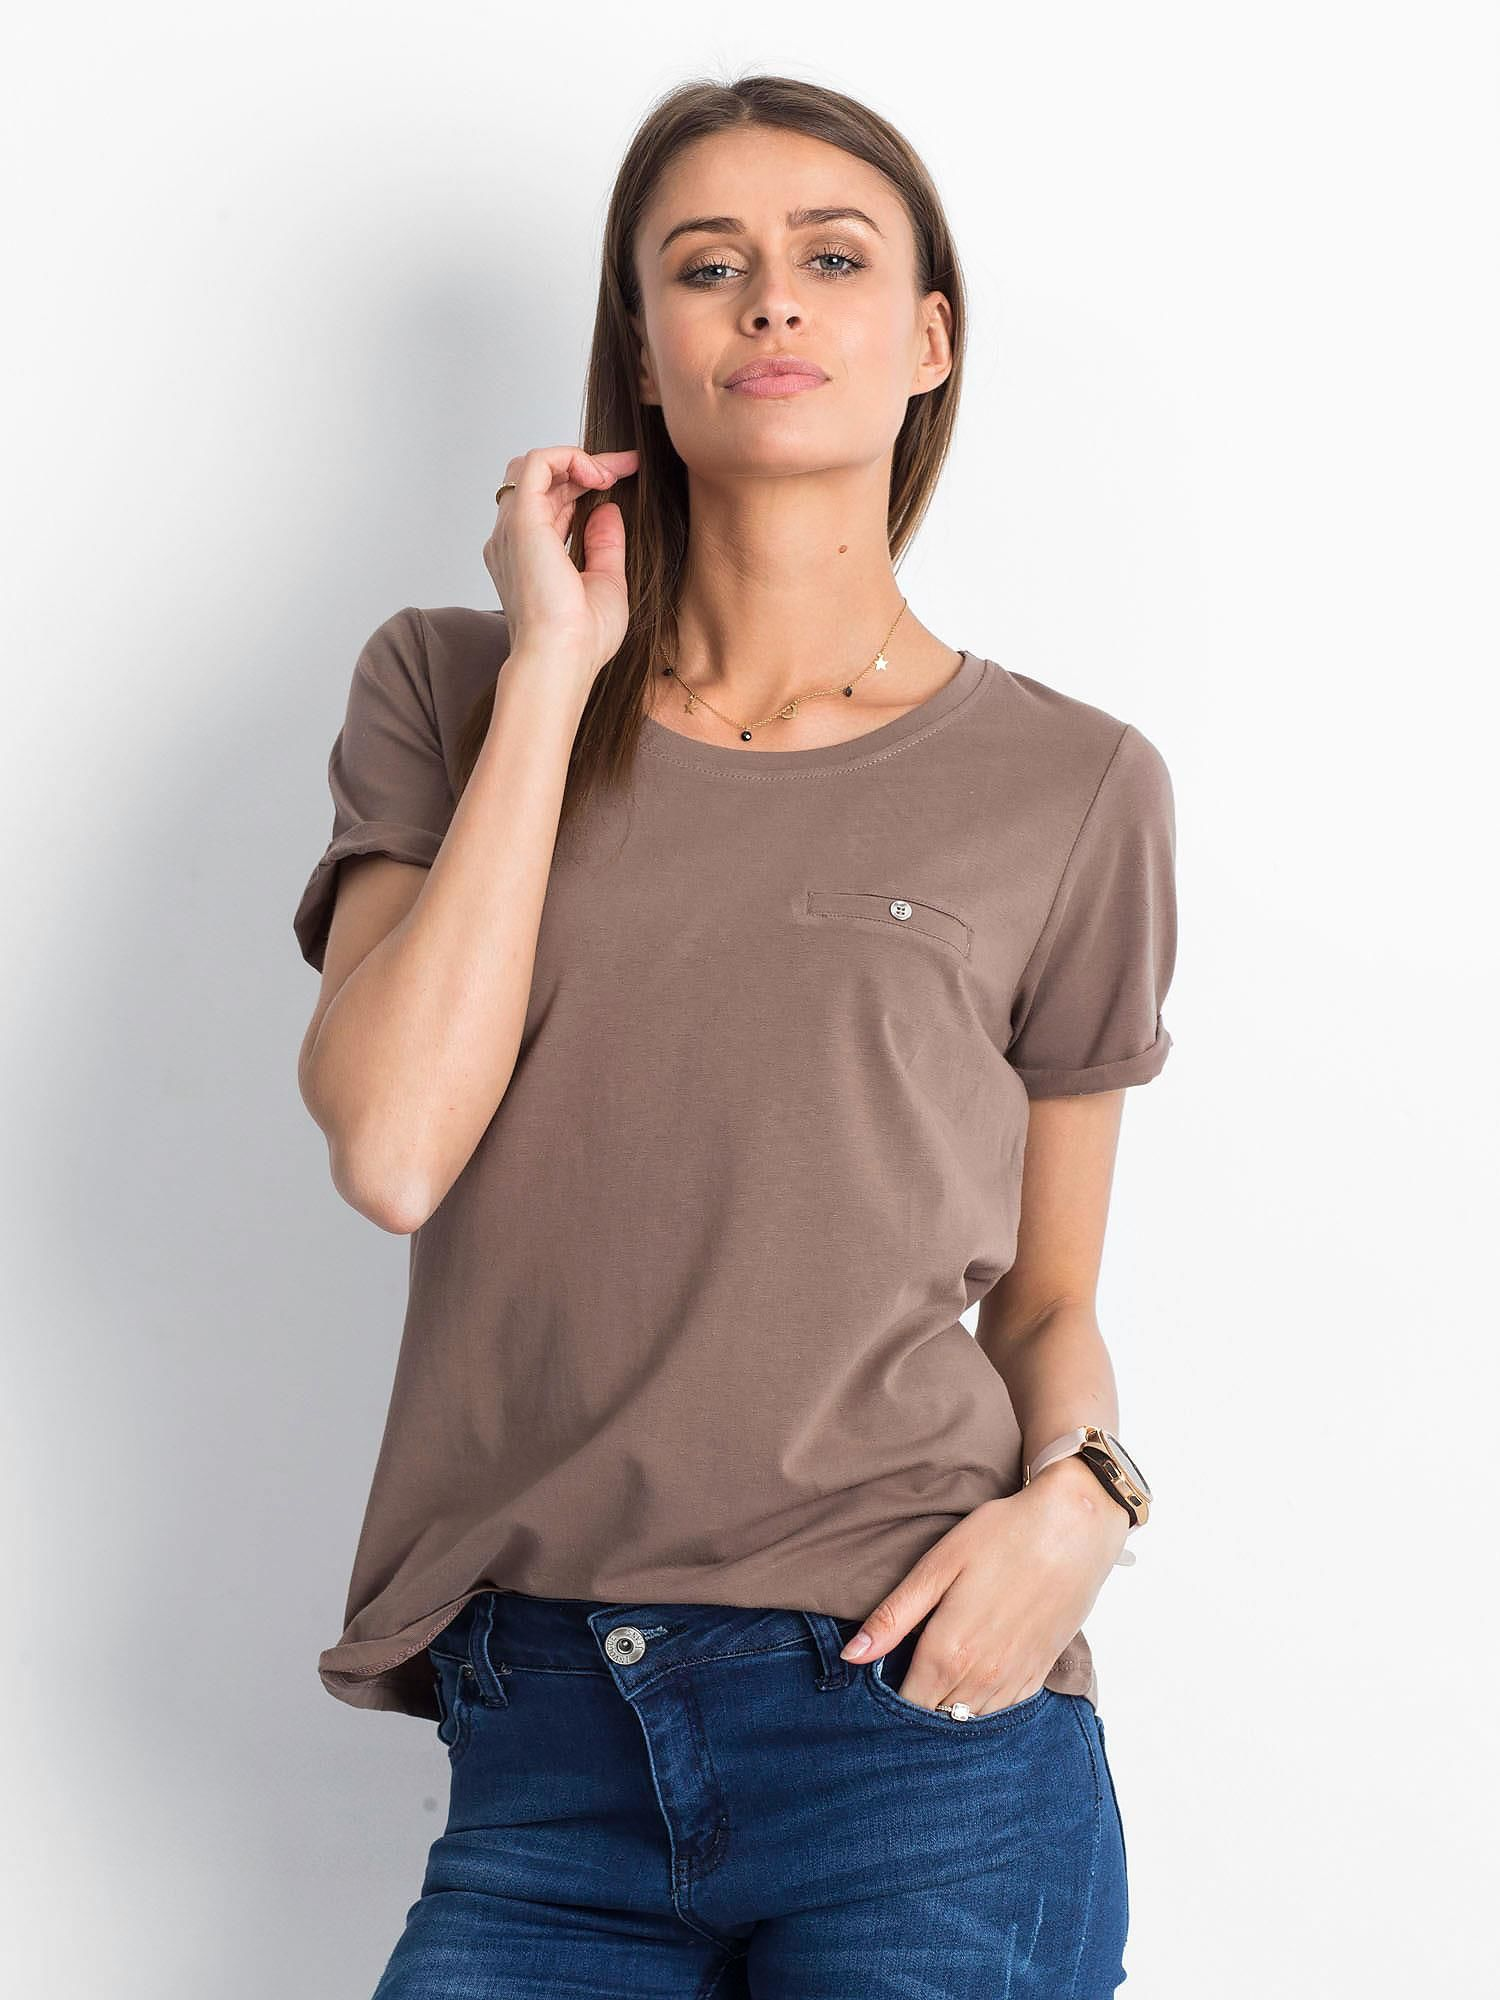 Dámske hnedé bavlnené tričko - XS